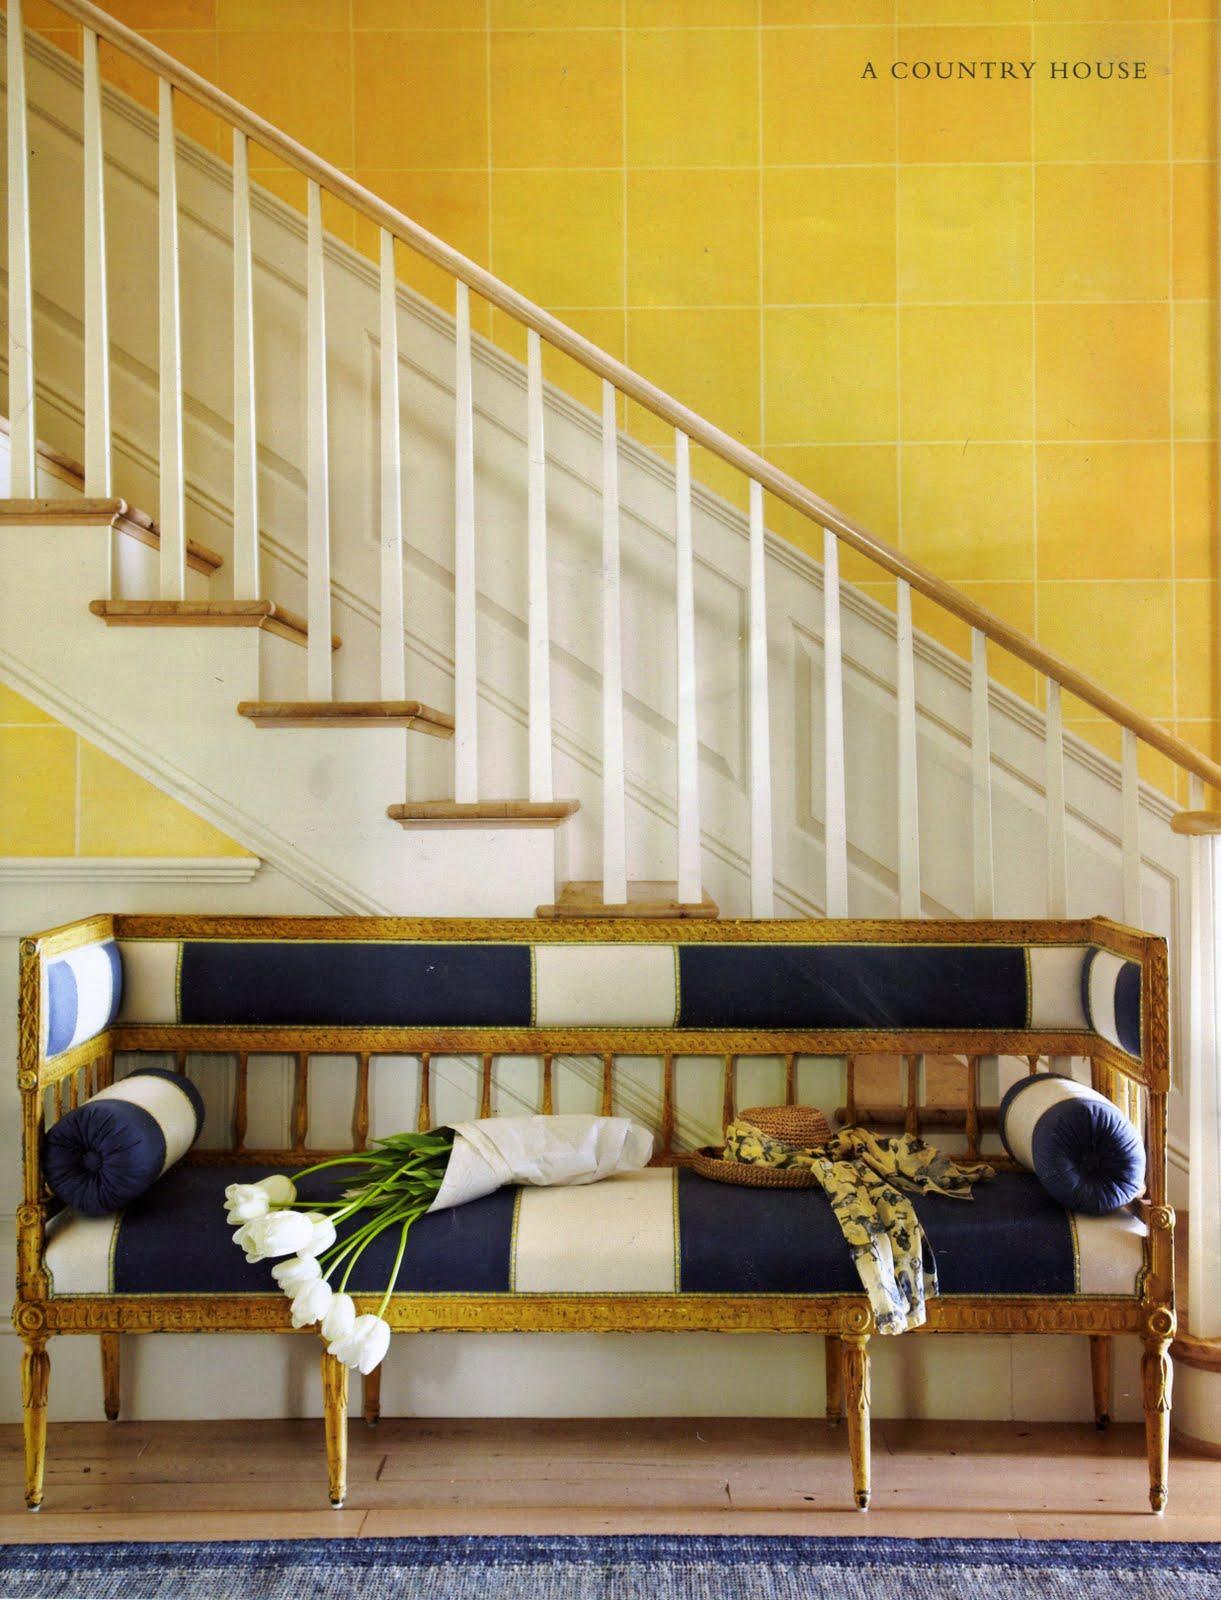 Richard hallberg at designer visions for Richard hallberg interior design